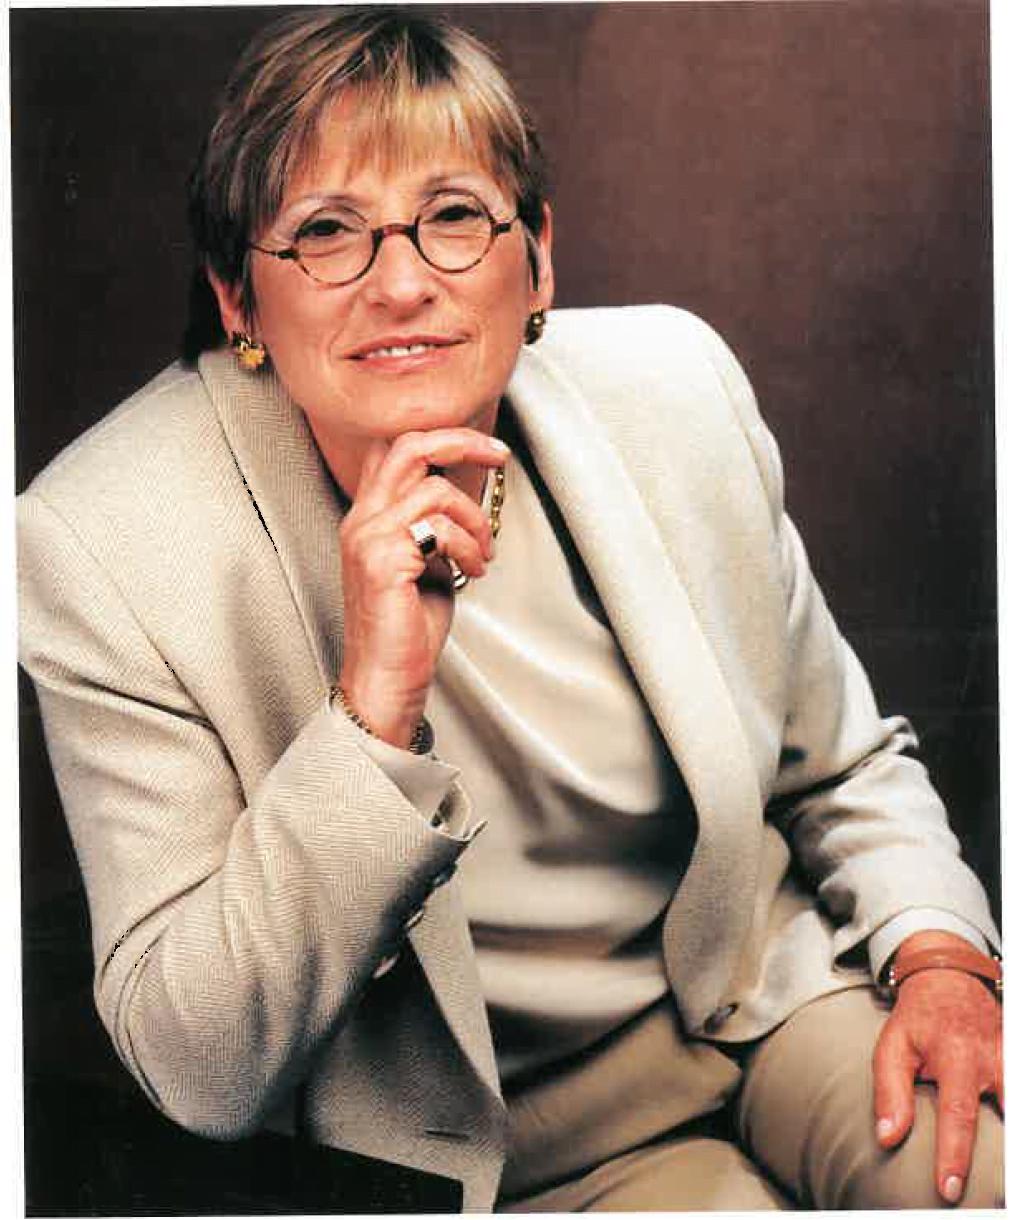 Mari Carme Sellarès